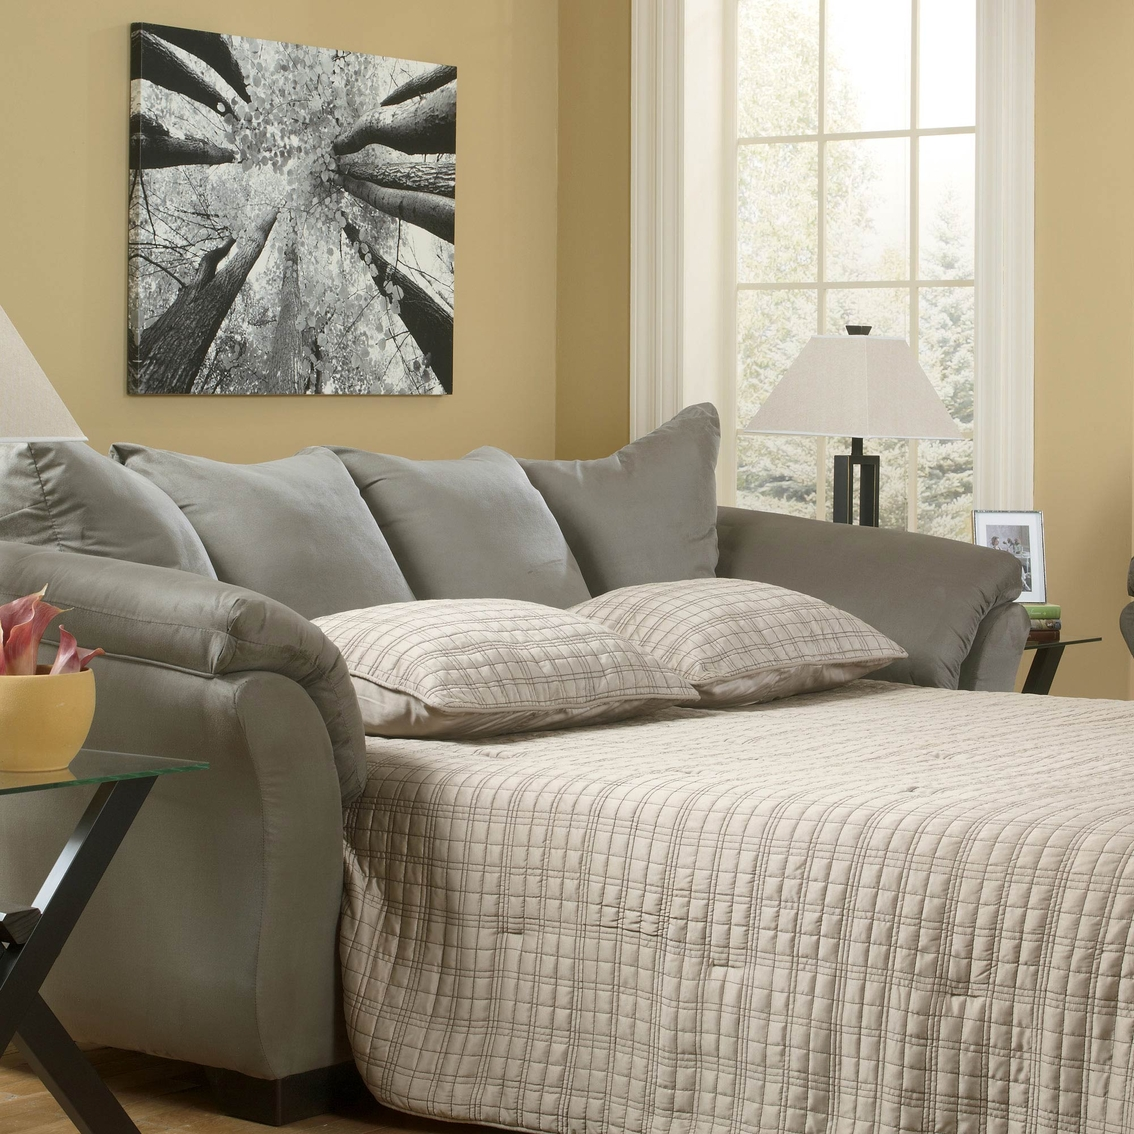 Signature Design By Ashley Darcy: Signature Design By Ashley Darcy Full Sofa Sleeper